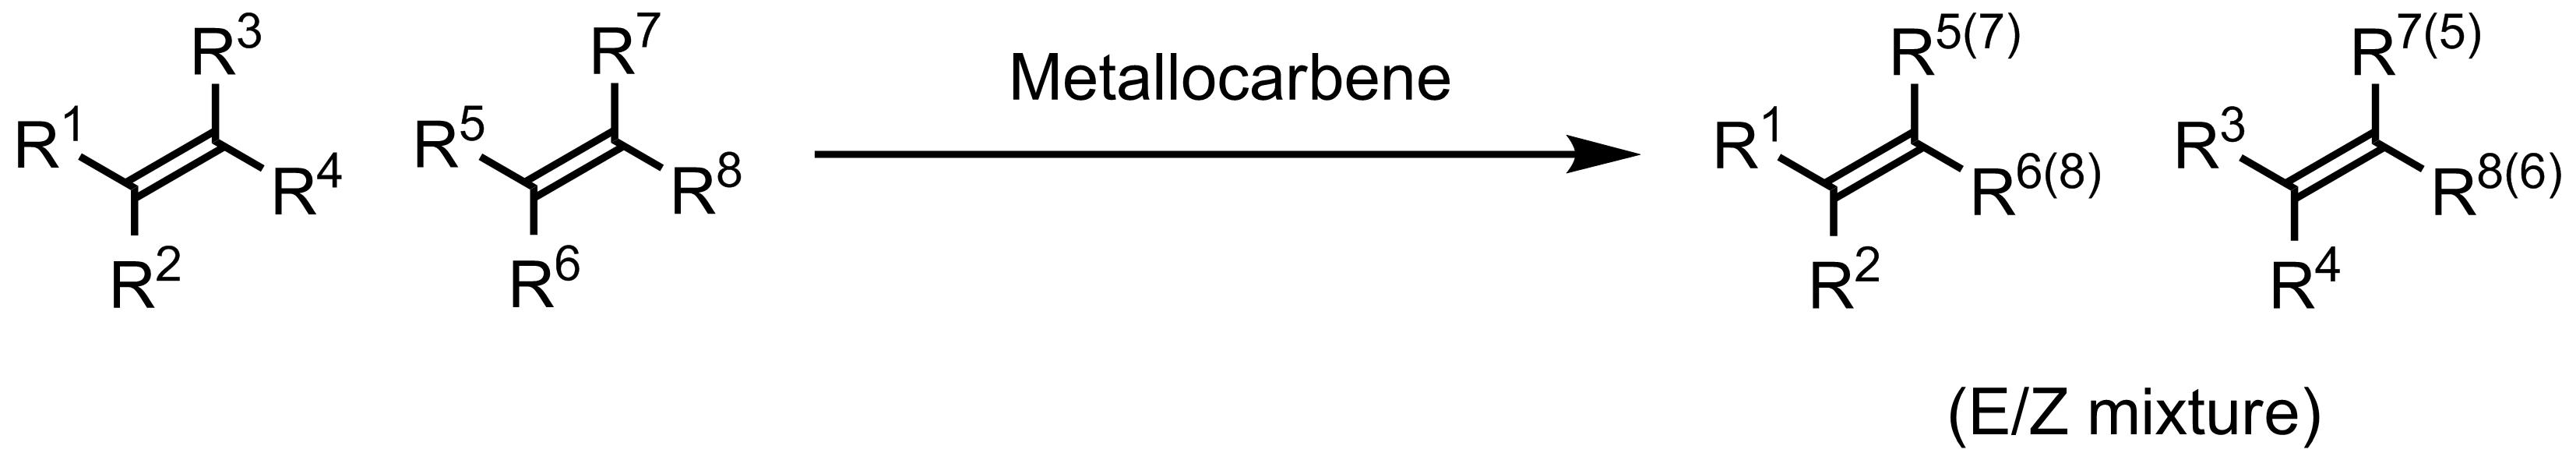 Schematic representation of the Olefin Metathesis.